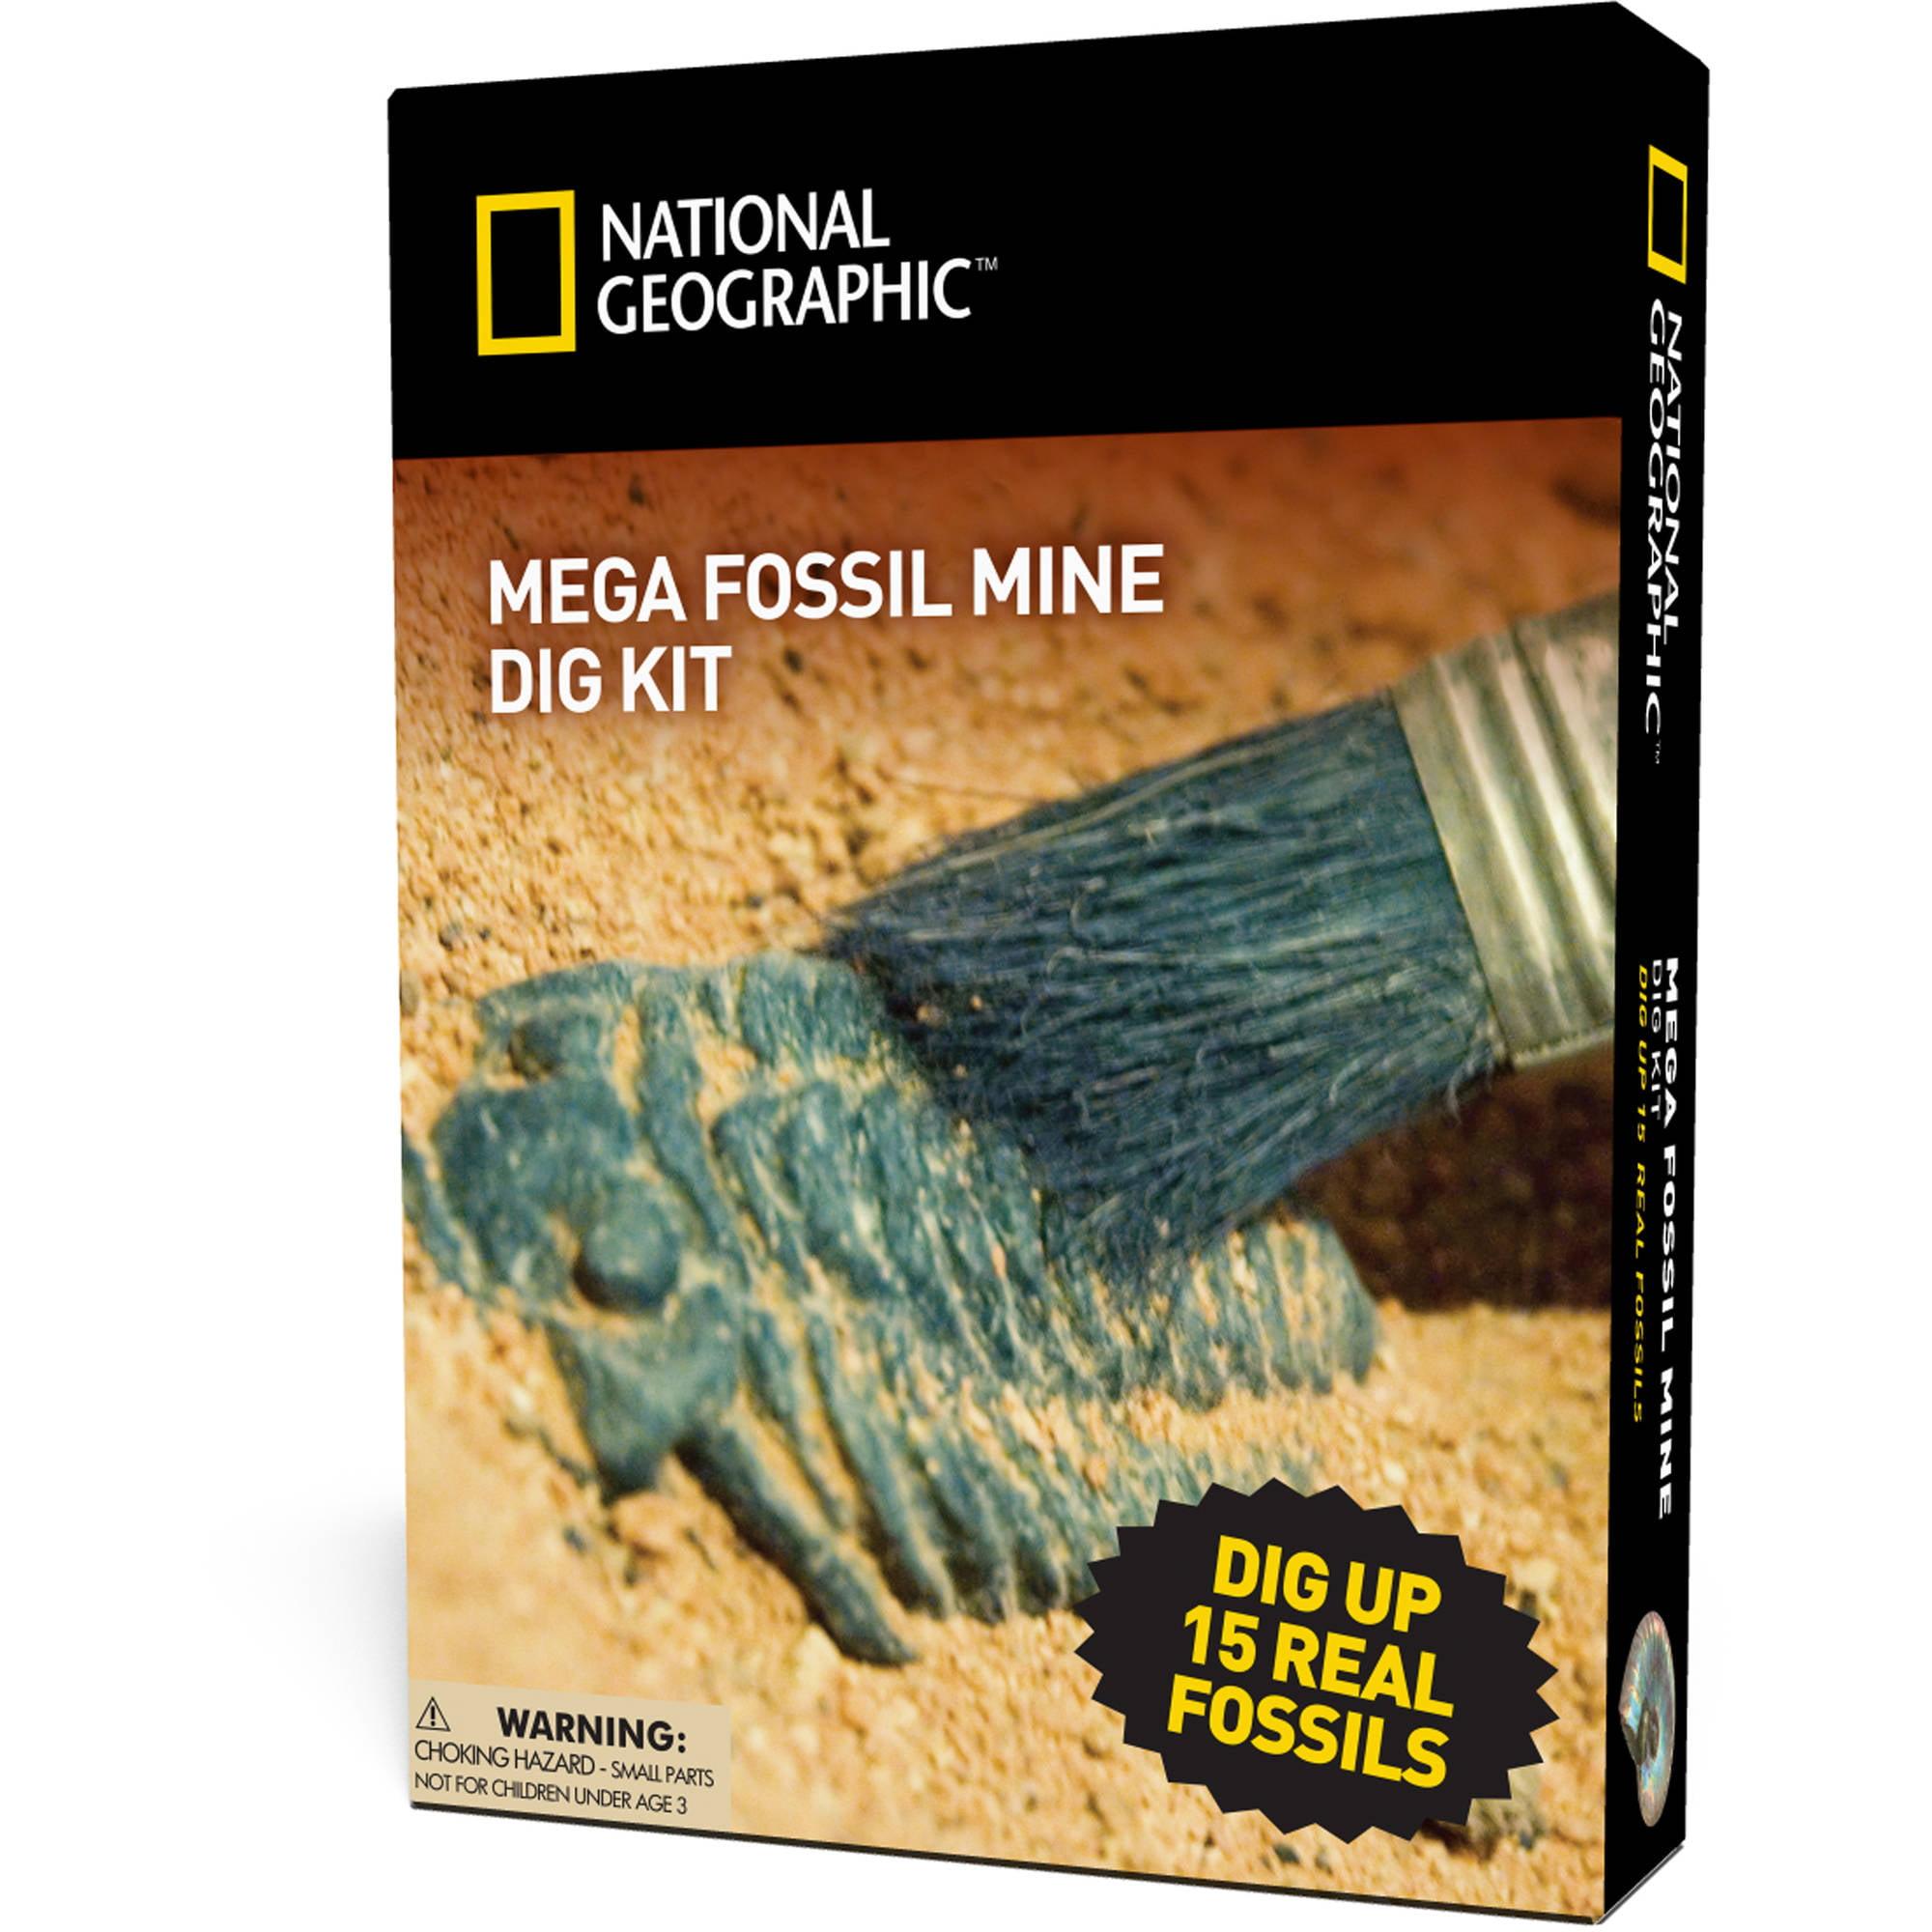 NATIONAL GEOGRAPHIC Mega Fossil Dig Kit Excavate Real Dinosaur Bone Fossils